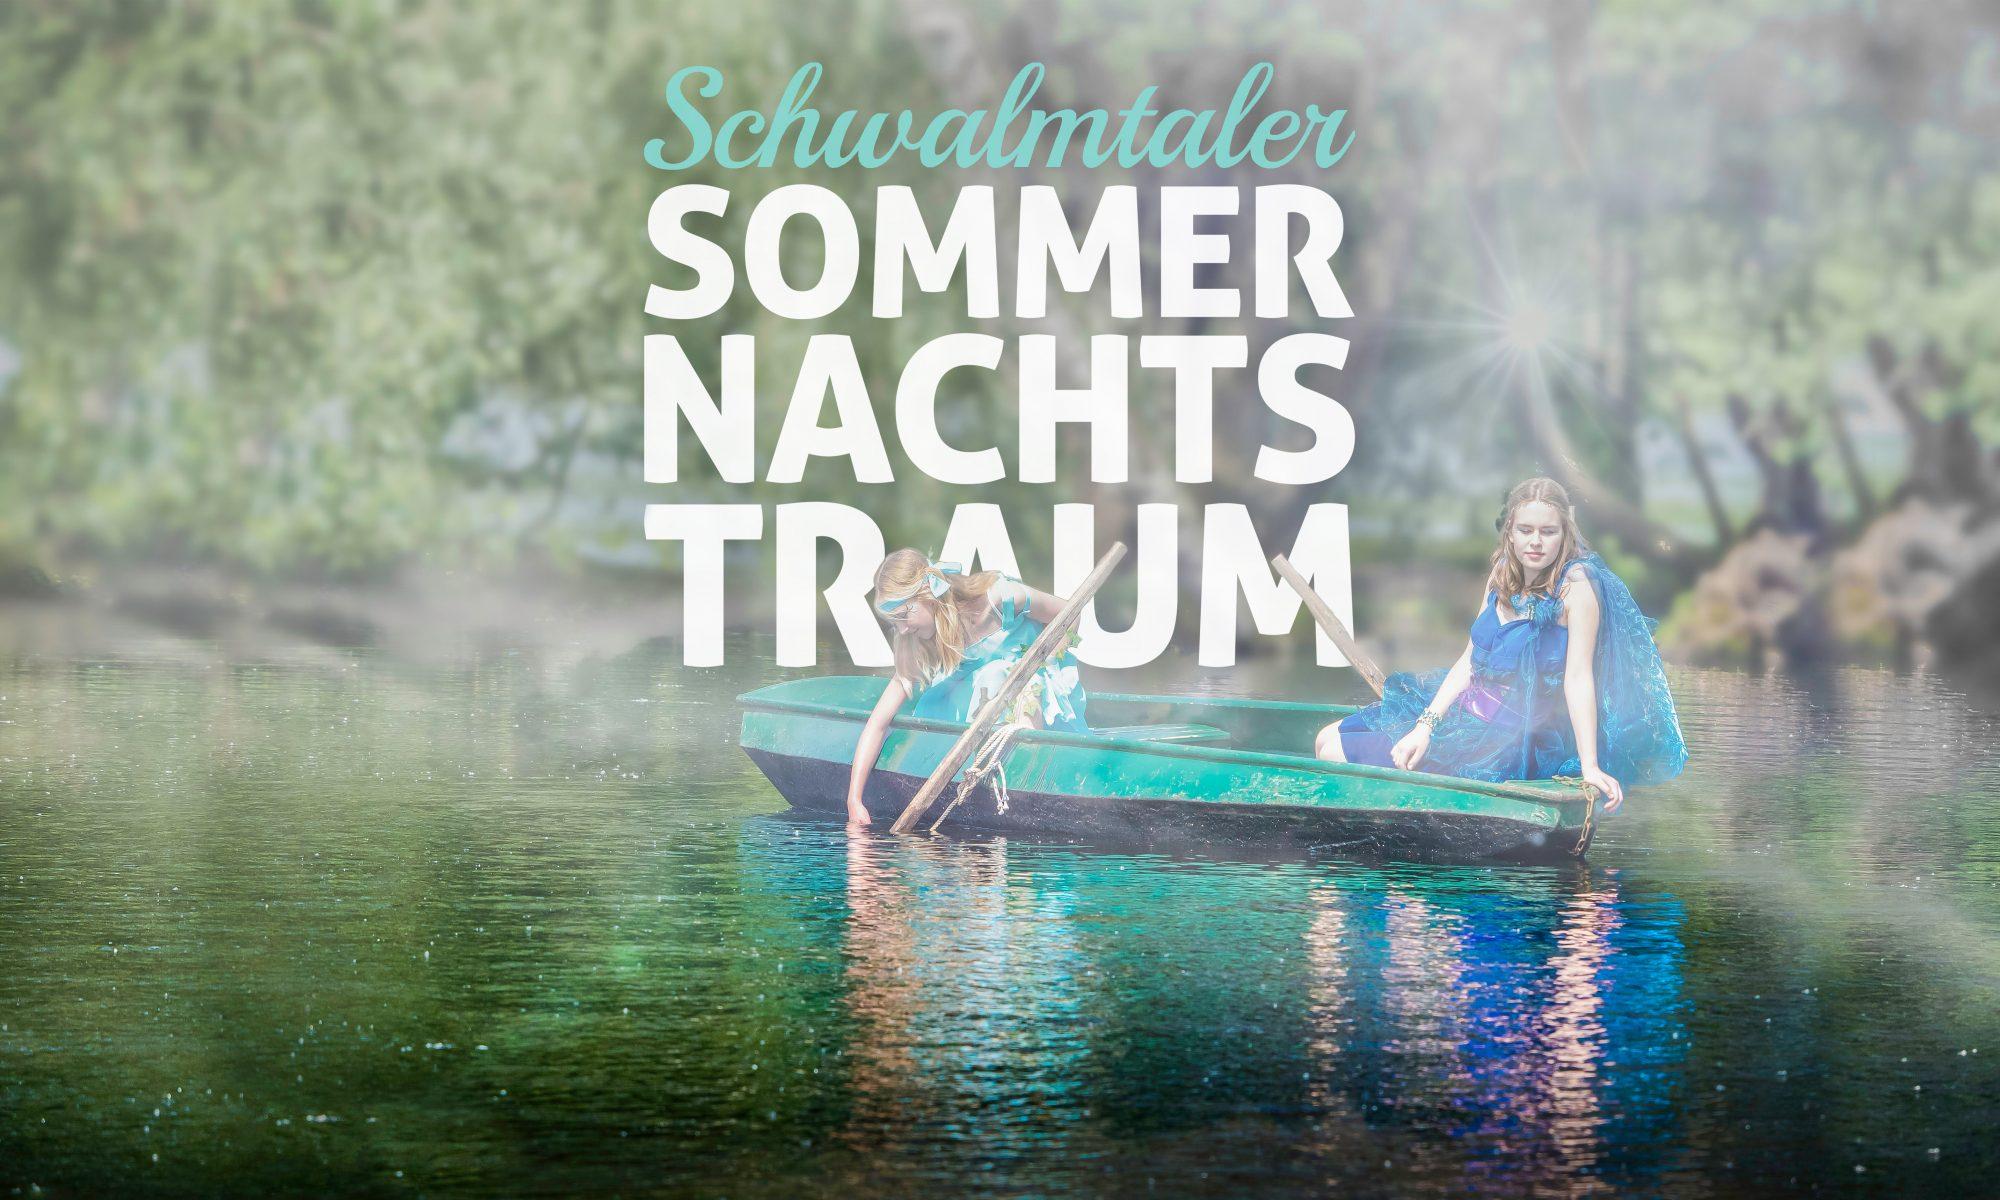 Schwalmtaler Sommernachtstraum 2020